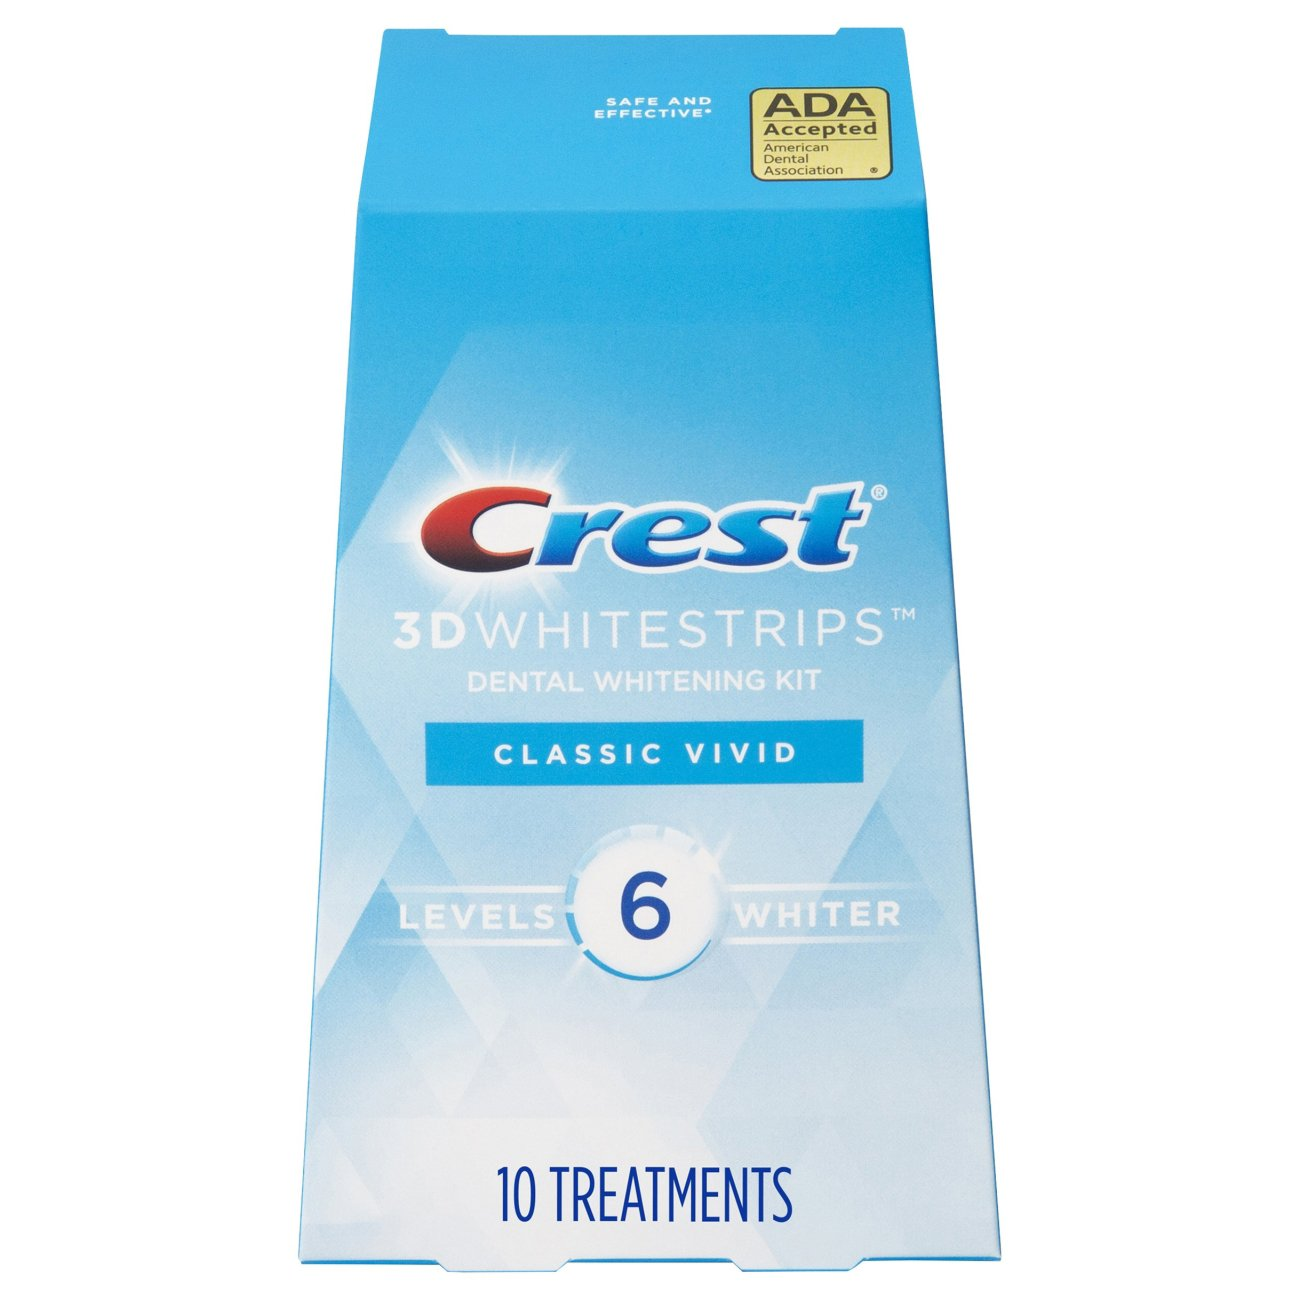 Crest 3d Whitestrips Classic Vivid Teeth Whitening Kit Shop